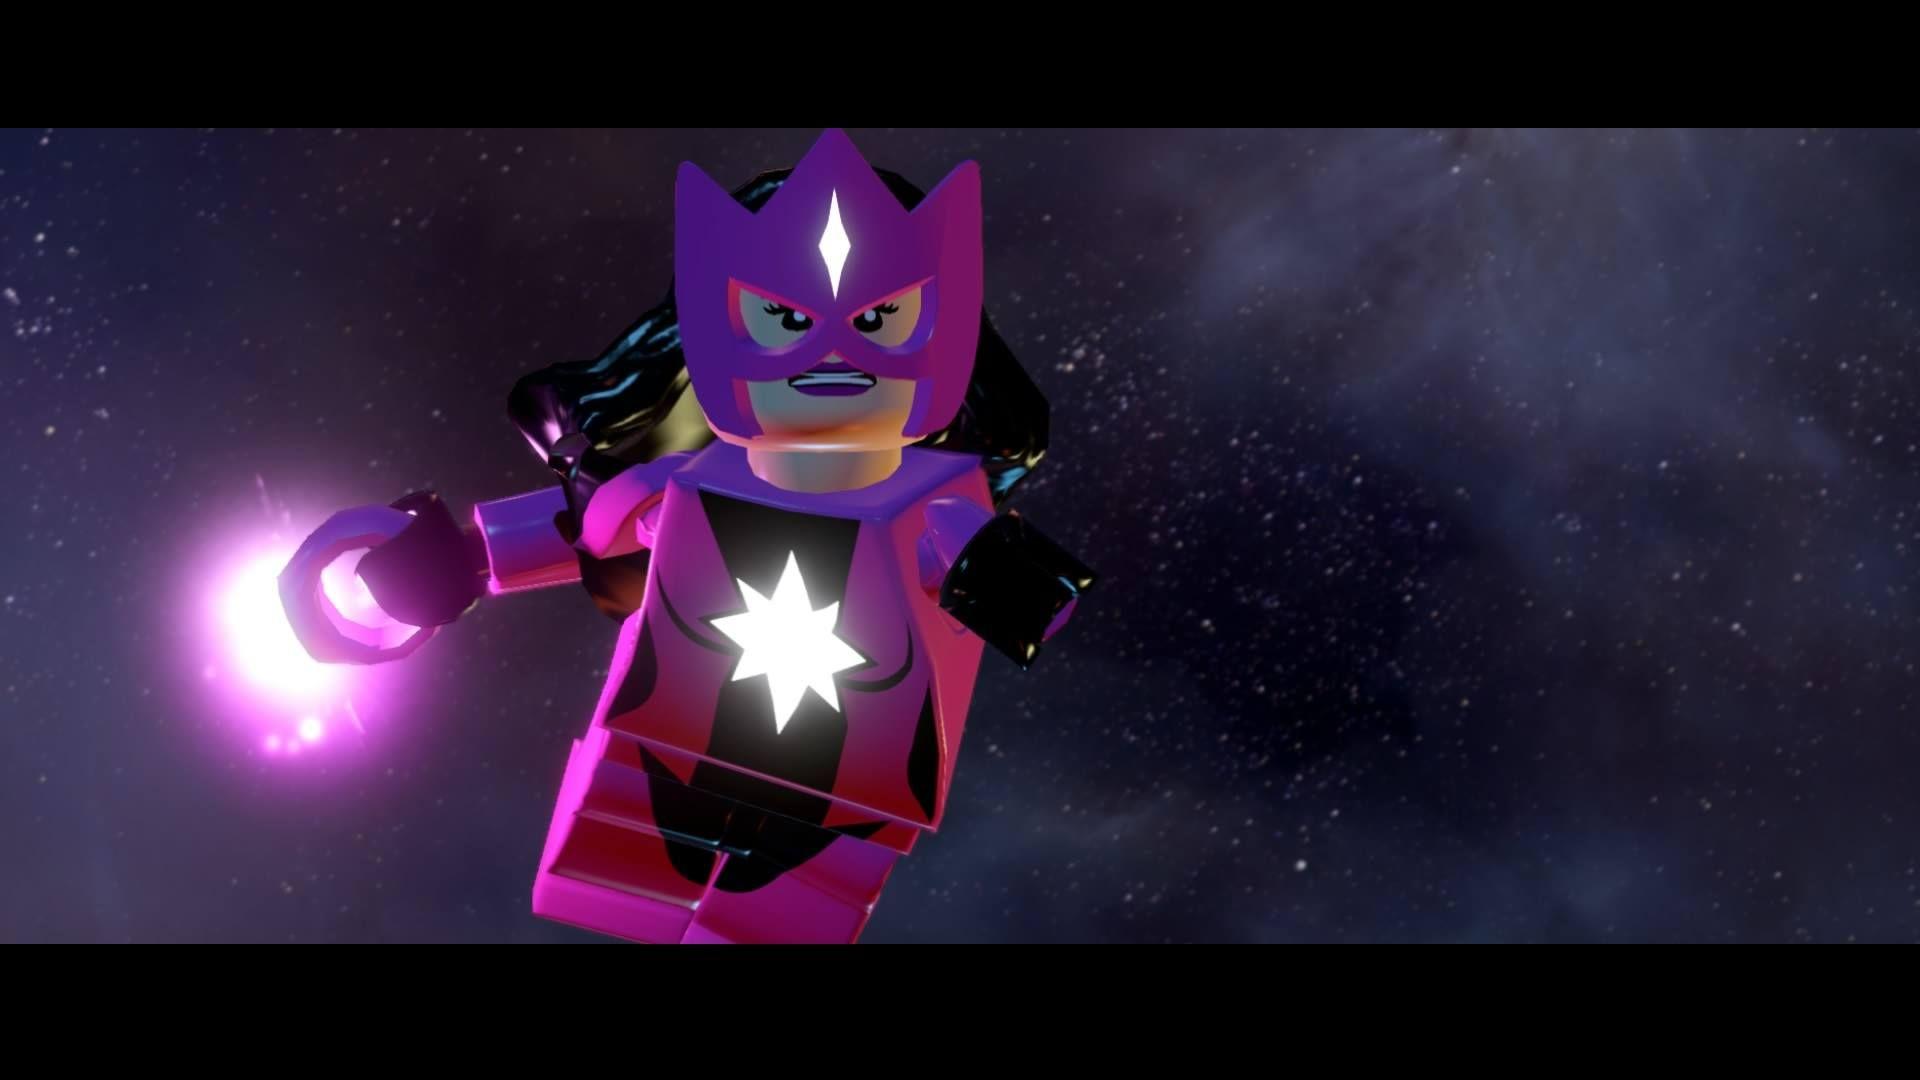 Deathstroke LEGO Batman 3 Characters   LEGO Batman 3: Beyond Gotham